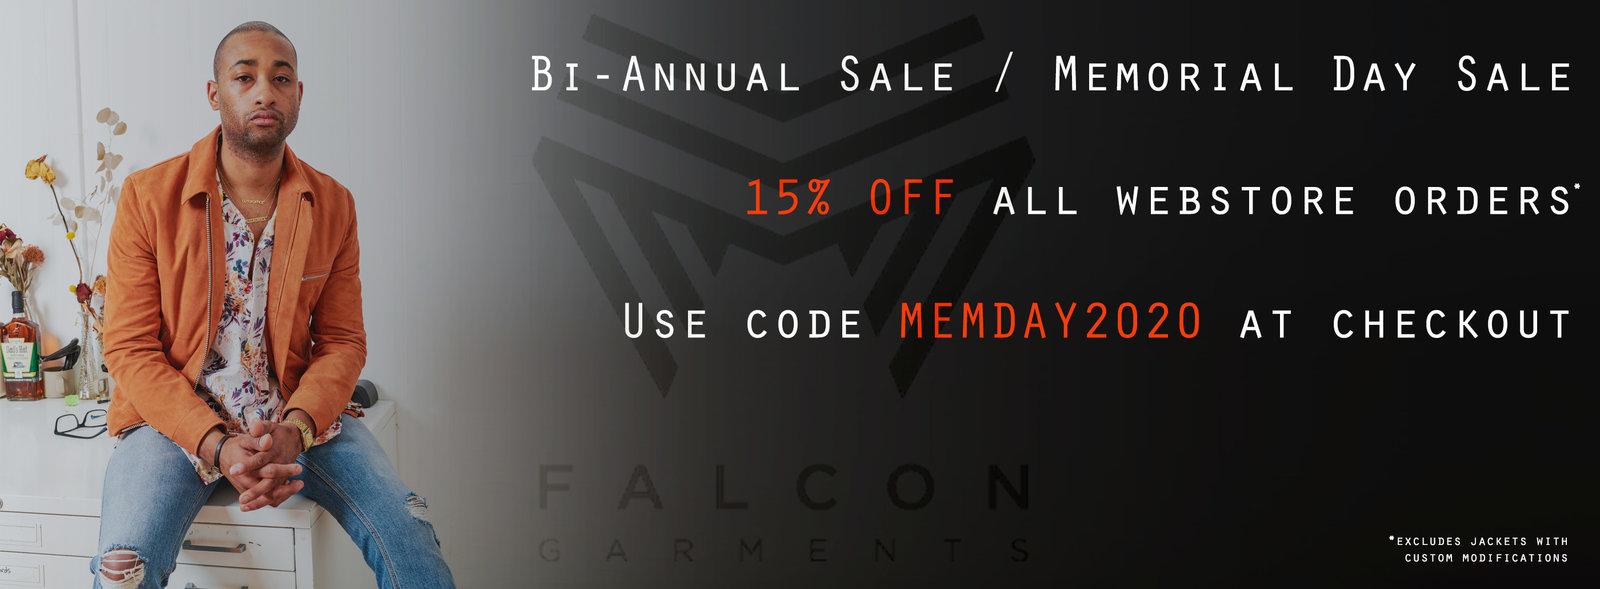 Falcon_MemDay2020_SF_Banner.jpg